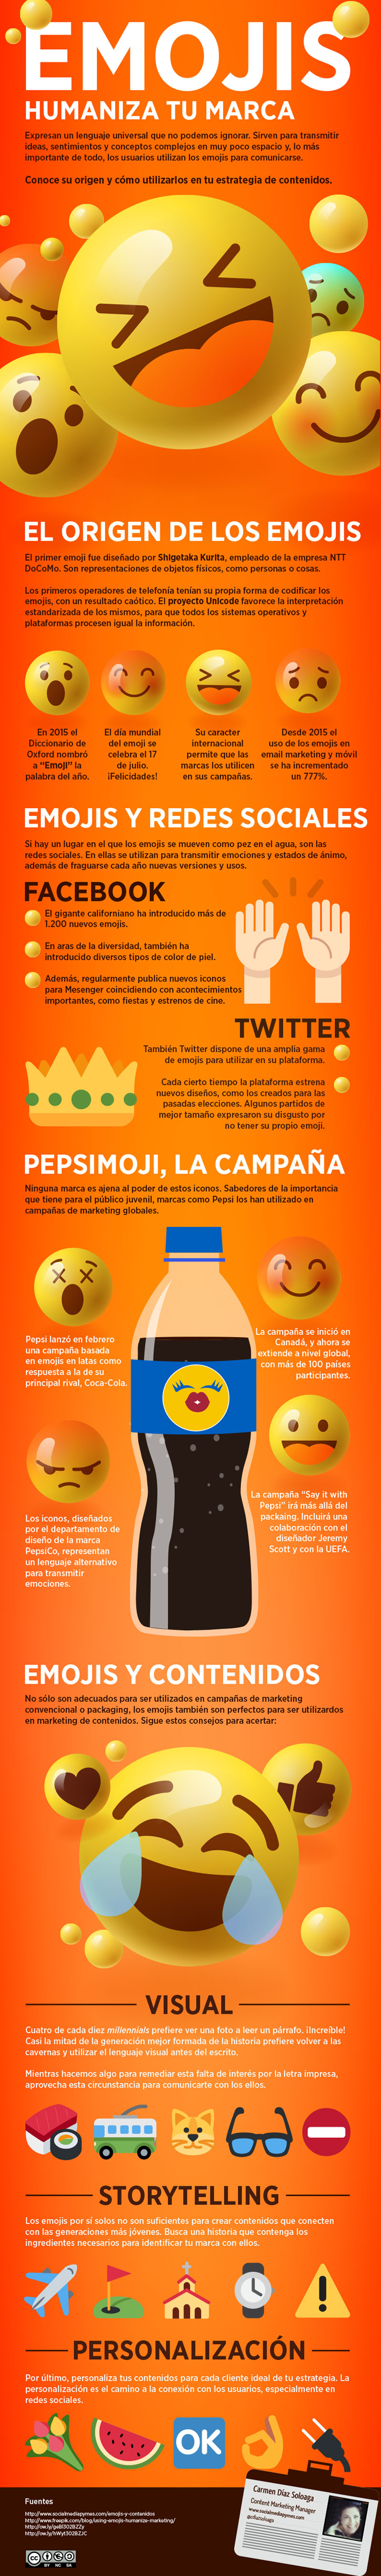 Emojis para humanizar tu Marca